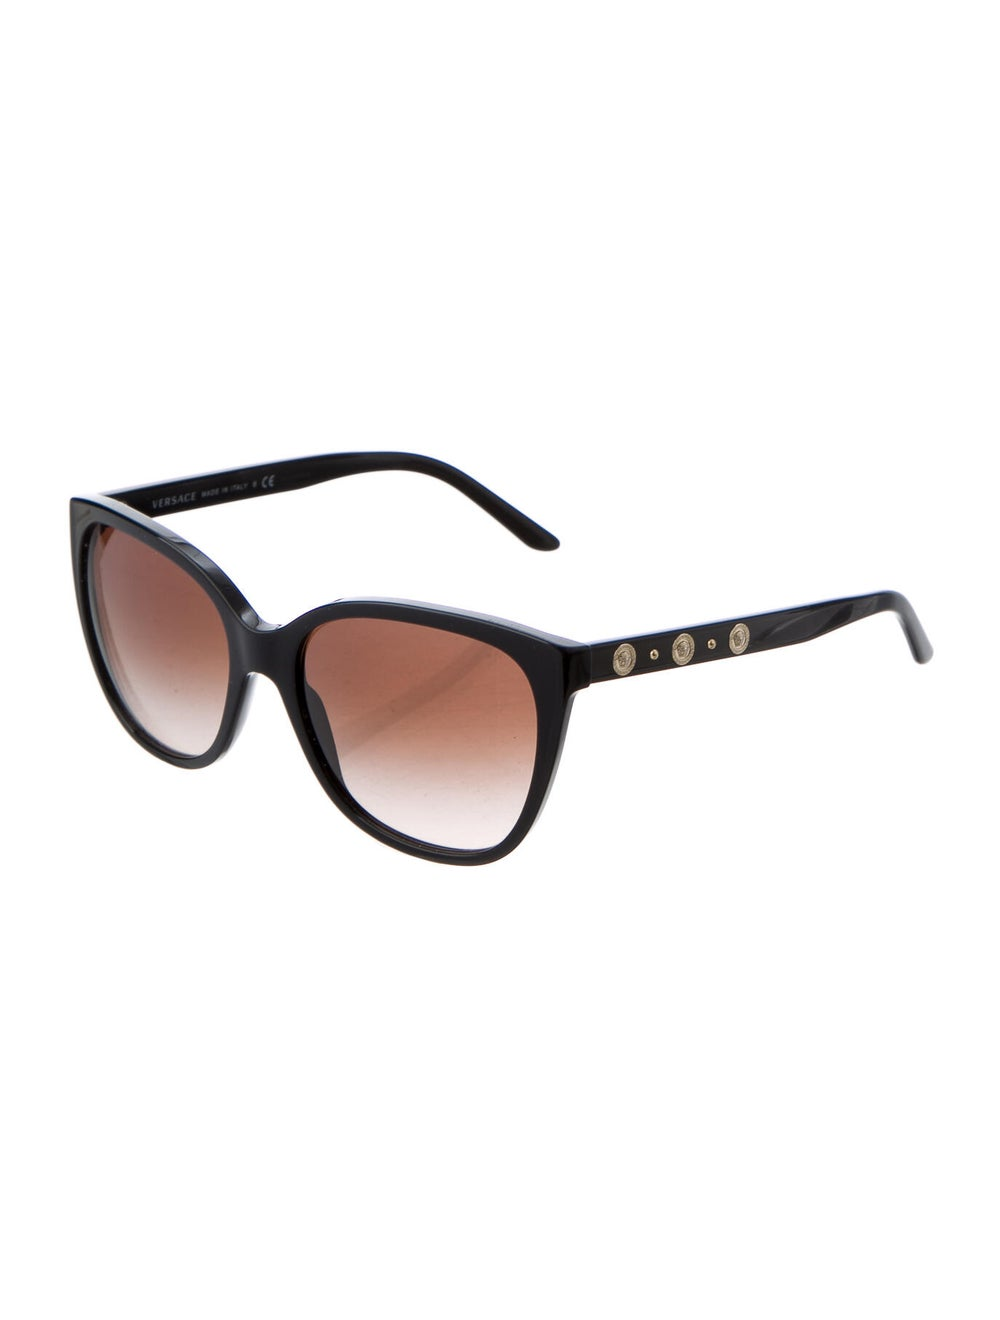 Versace Medusa Insignia Cat-Eye Sunglasses Black - image 2